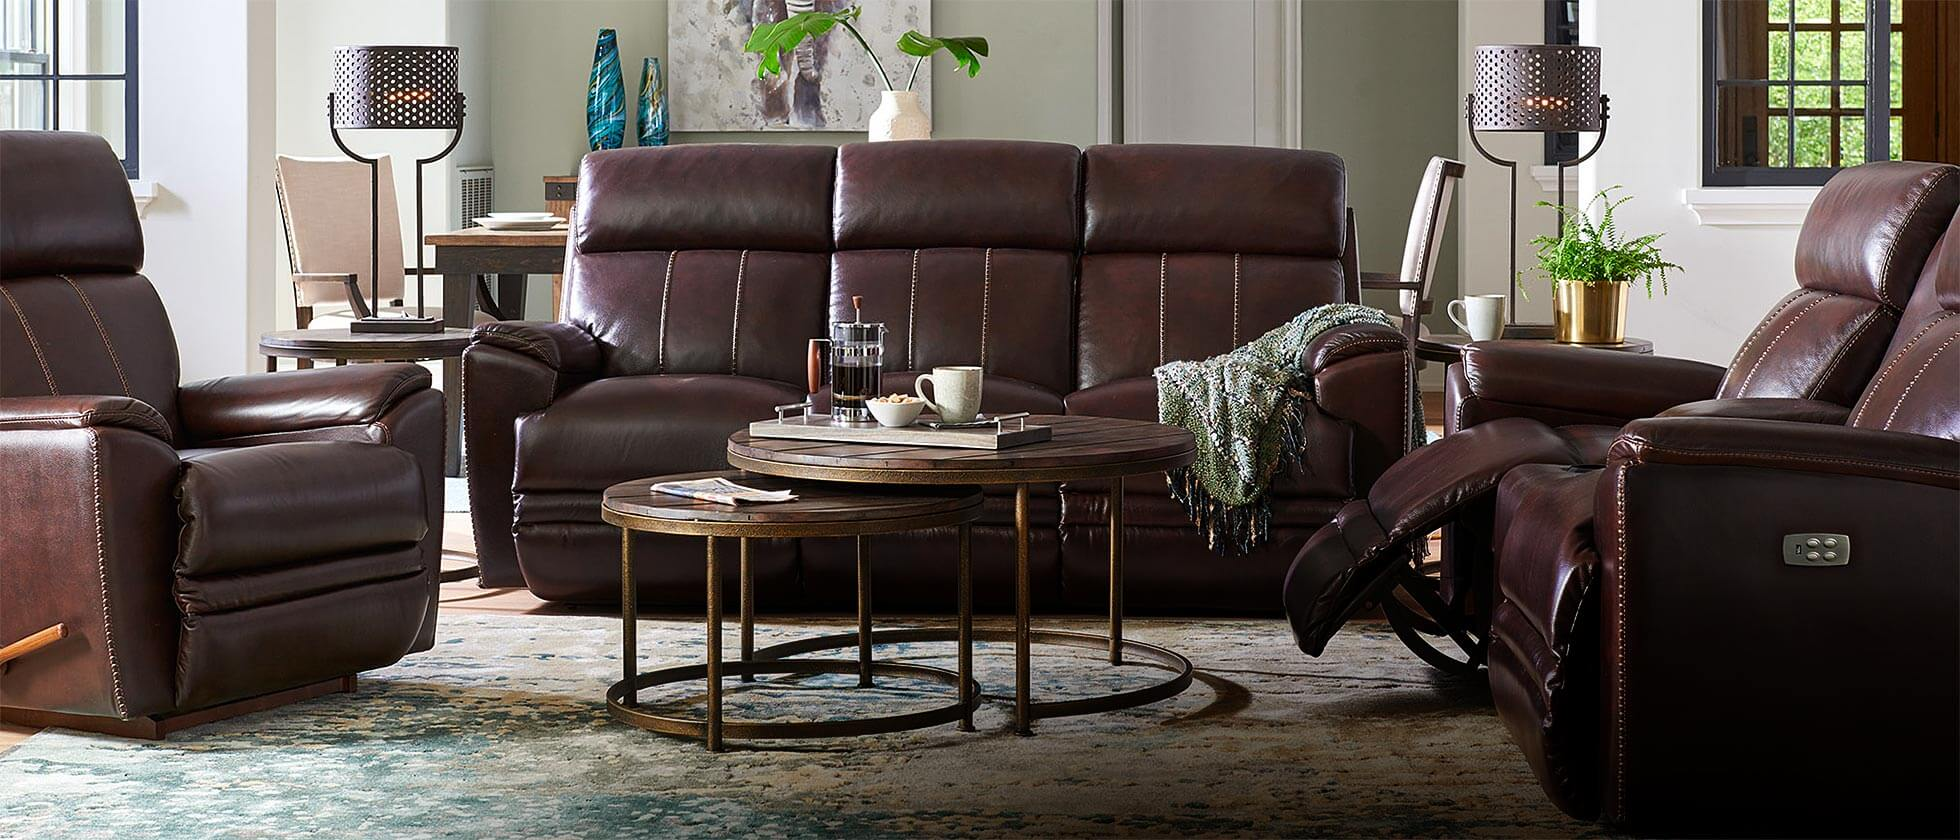 f2e8c90c67b7 Home Furniture  Living Room   Bedroom Furniture